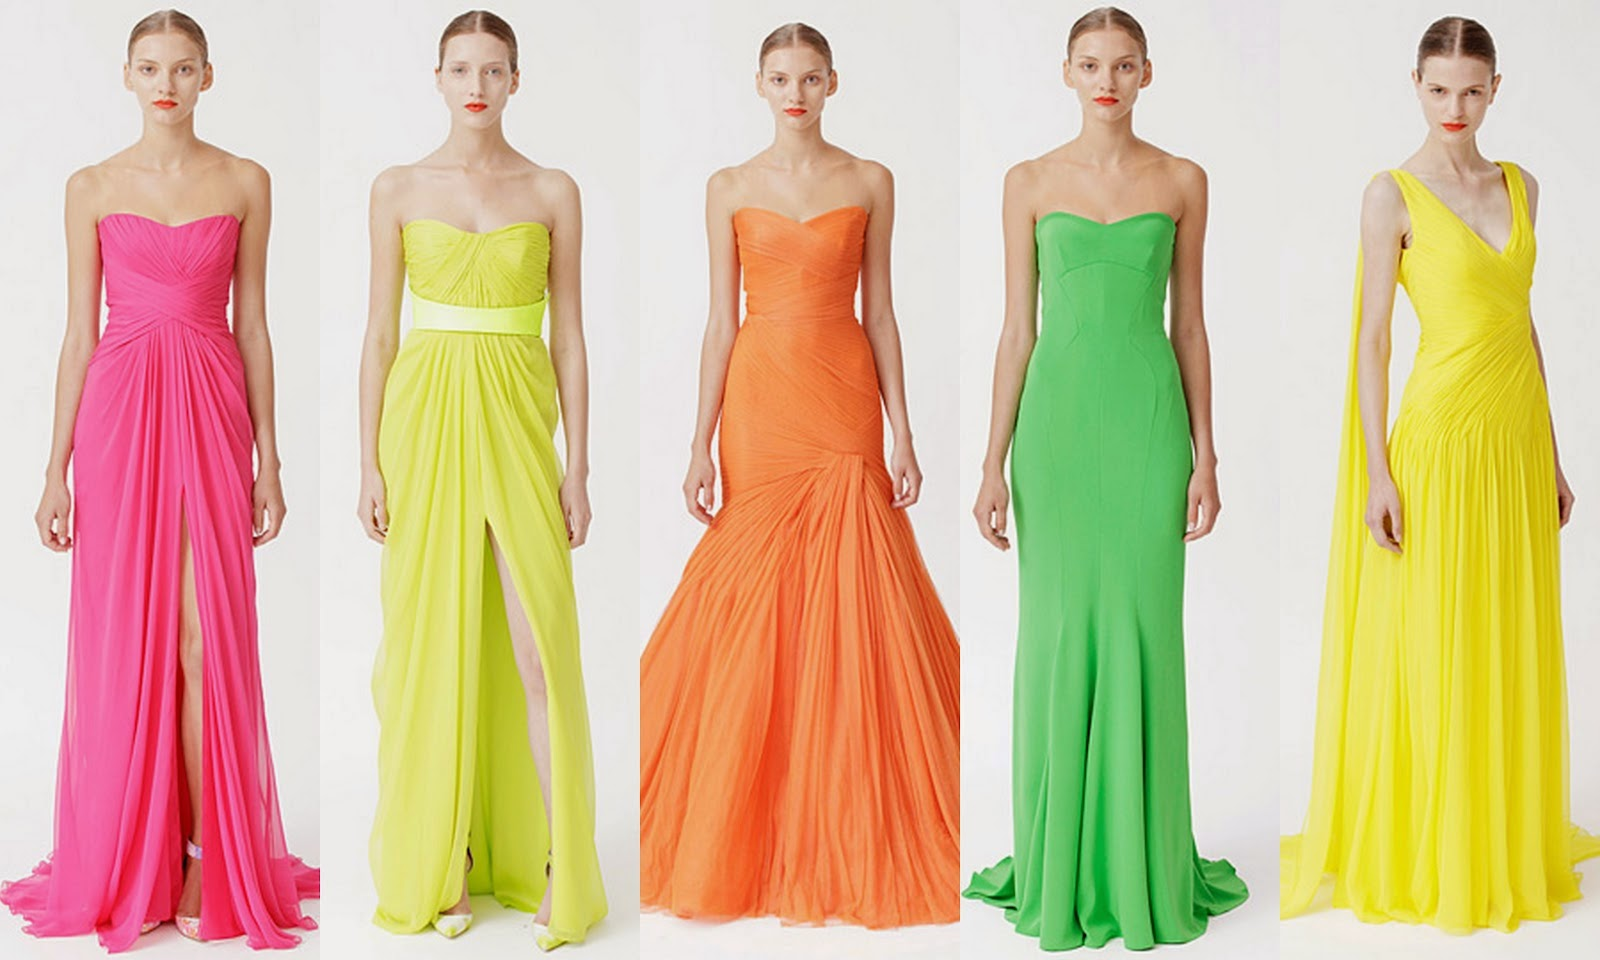 neon renkli kıyafetler